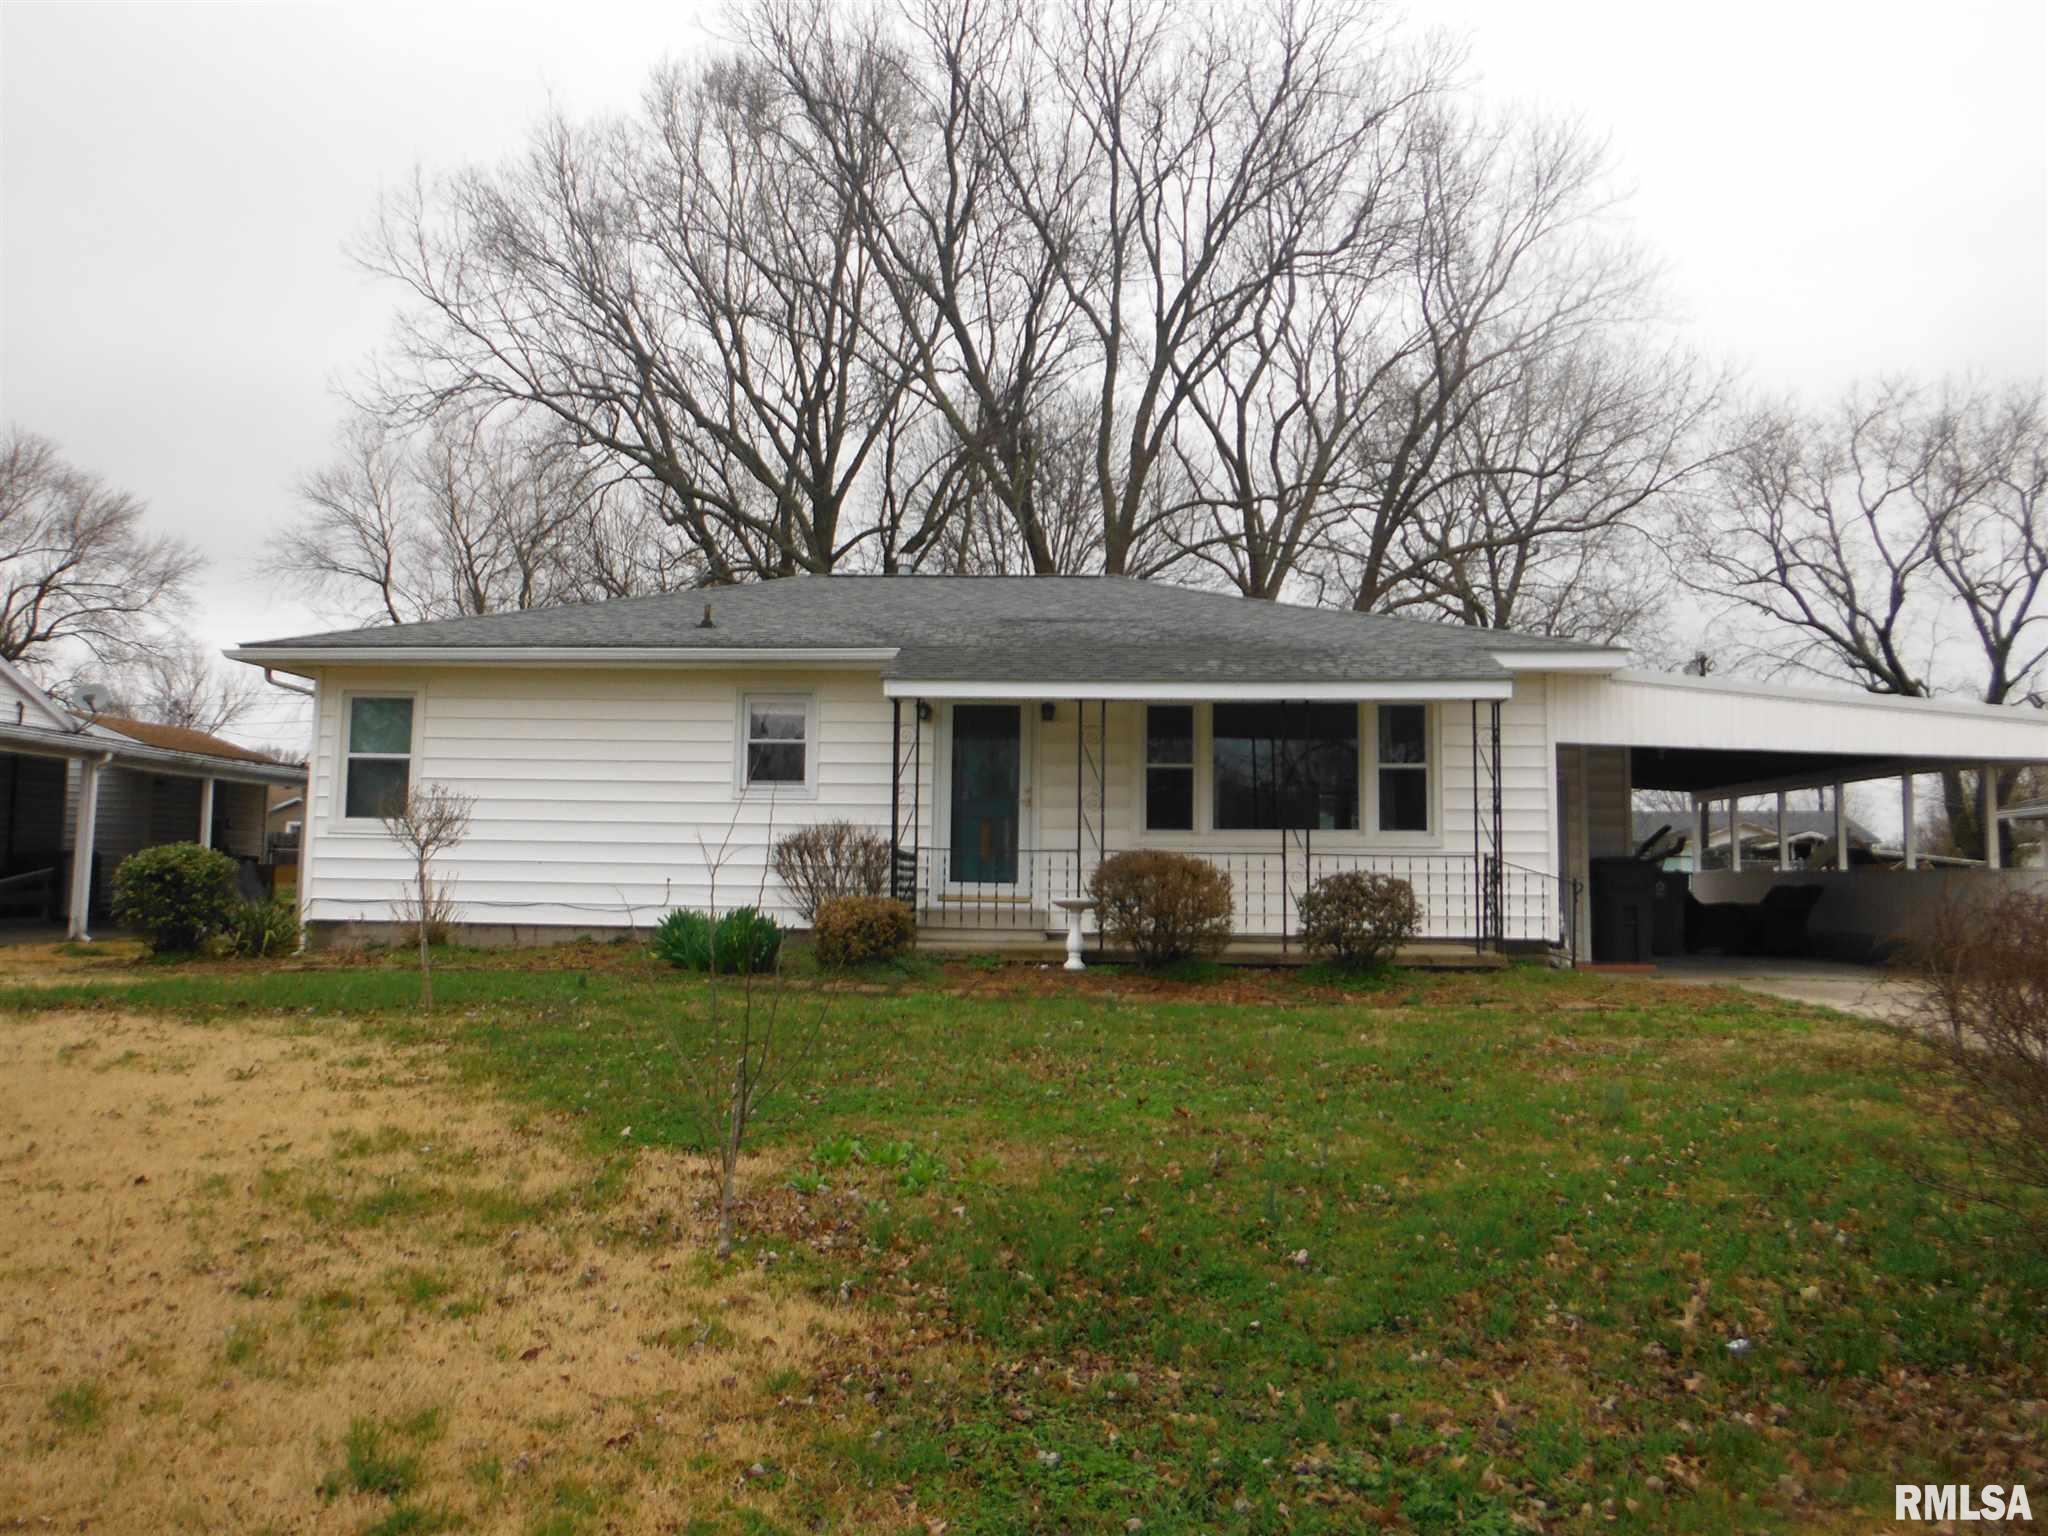 117 TURNER Property Photo - Anna, IL real estate listing